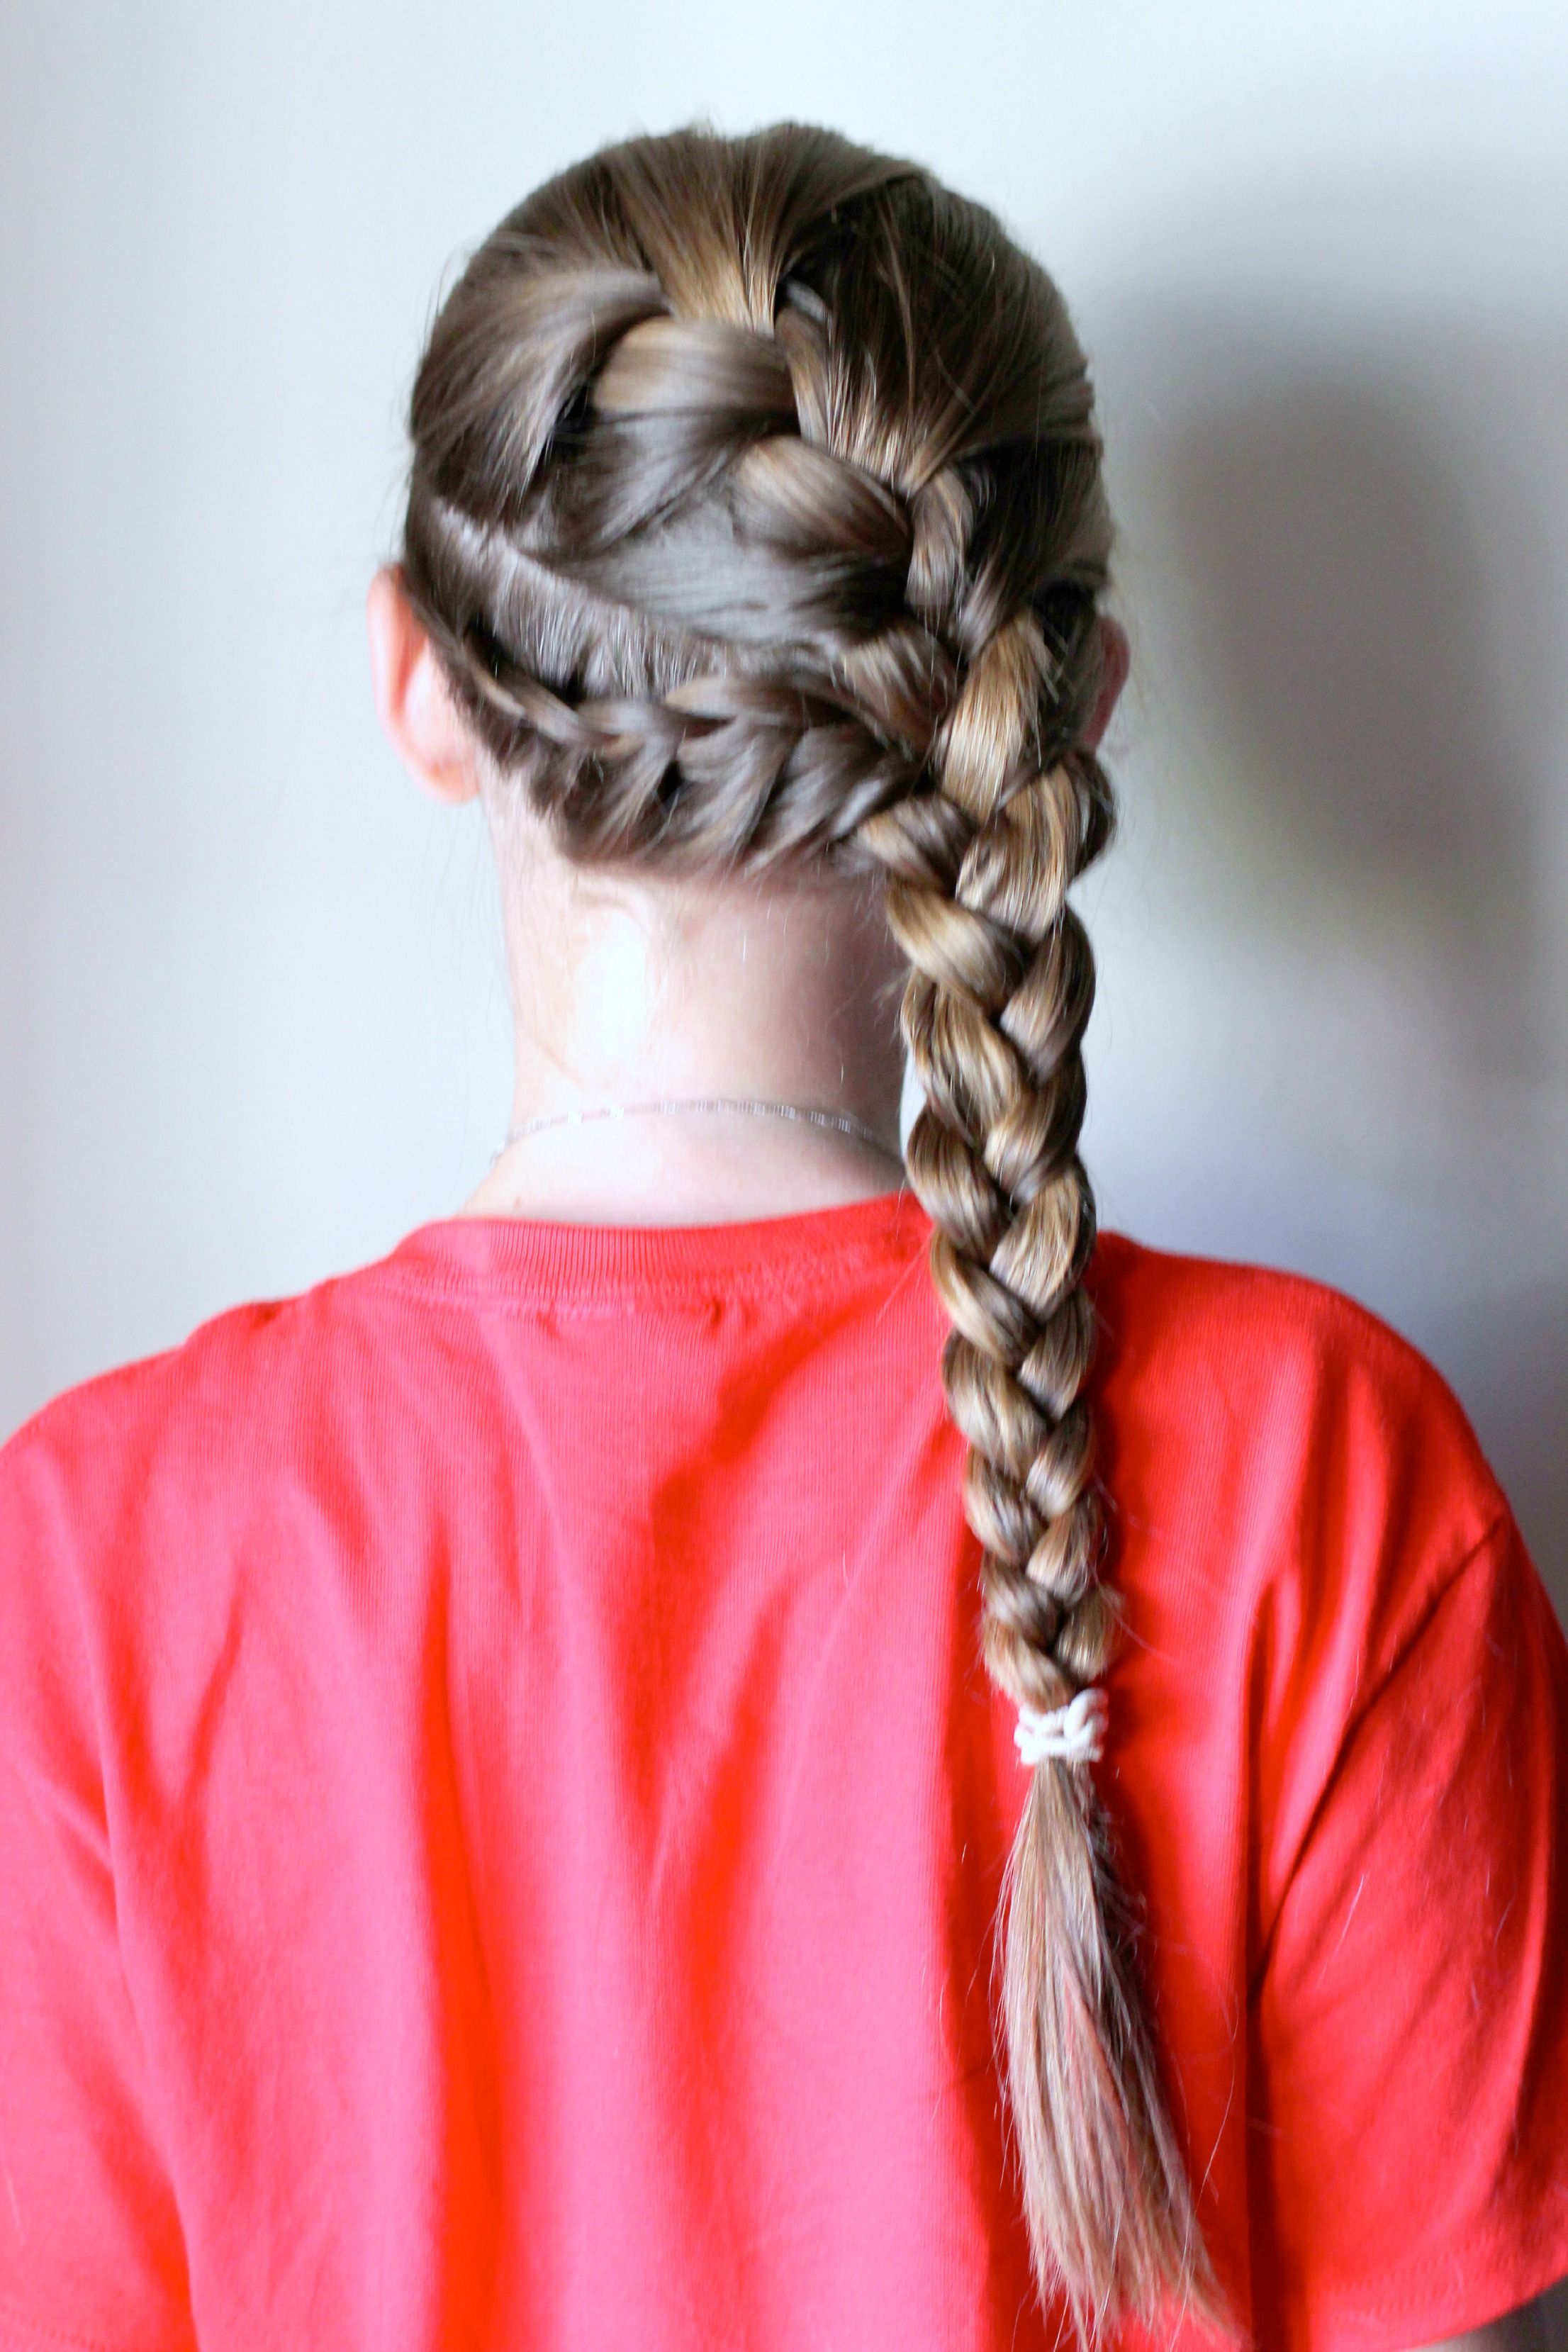 Soccer Hairstyles For Long Hair Girls Google Search Soccer Hairstyles Sporty Hairstyles Girl Hairstyles